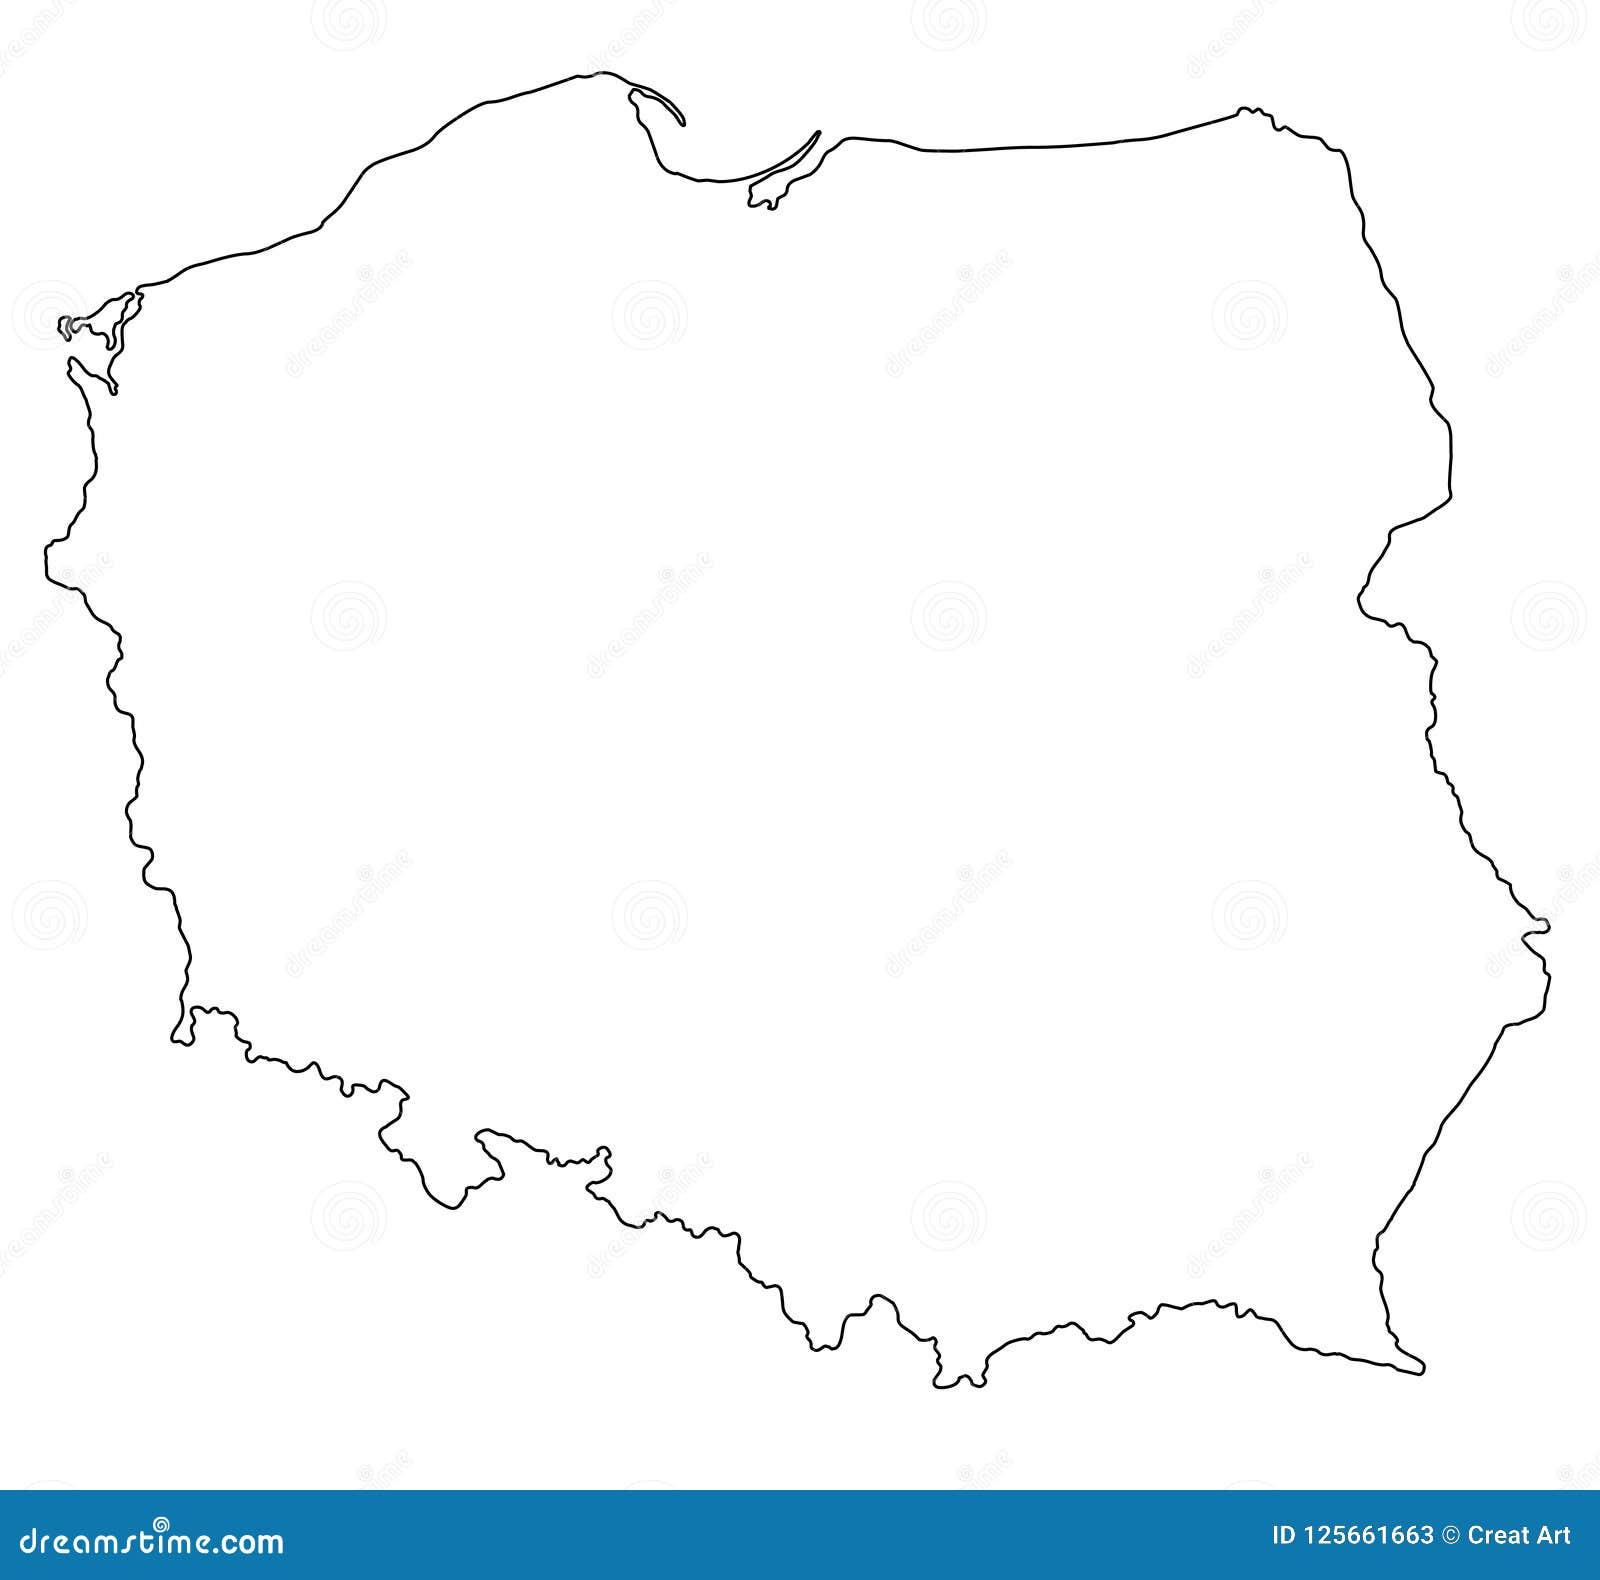 Poland Map Outline Vector Illustration Stock Vector Illustration